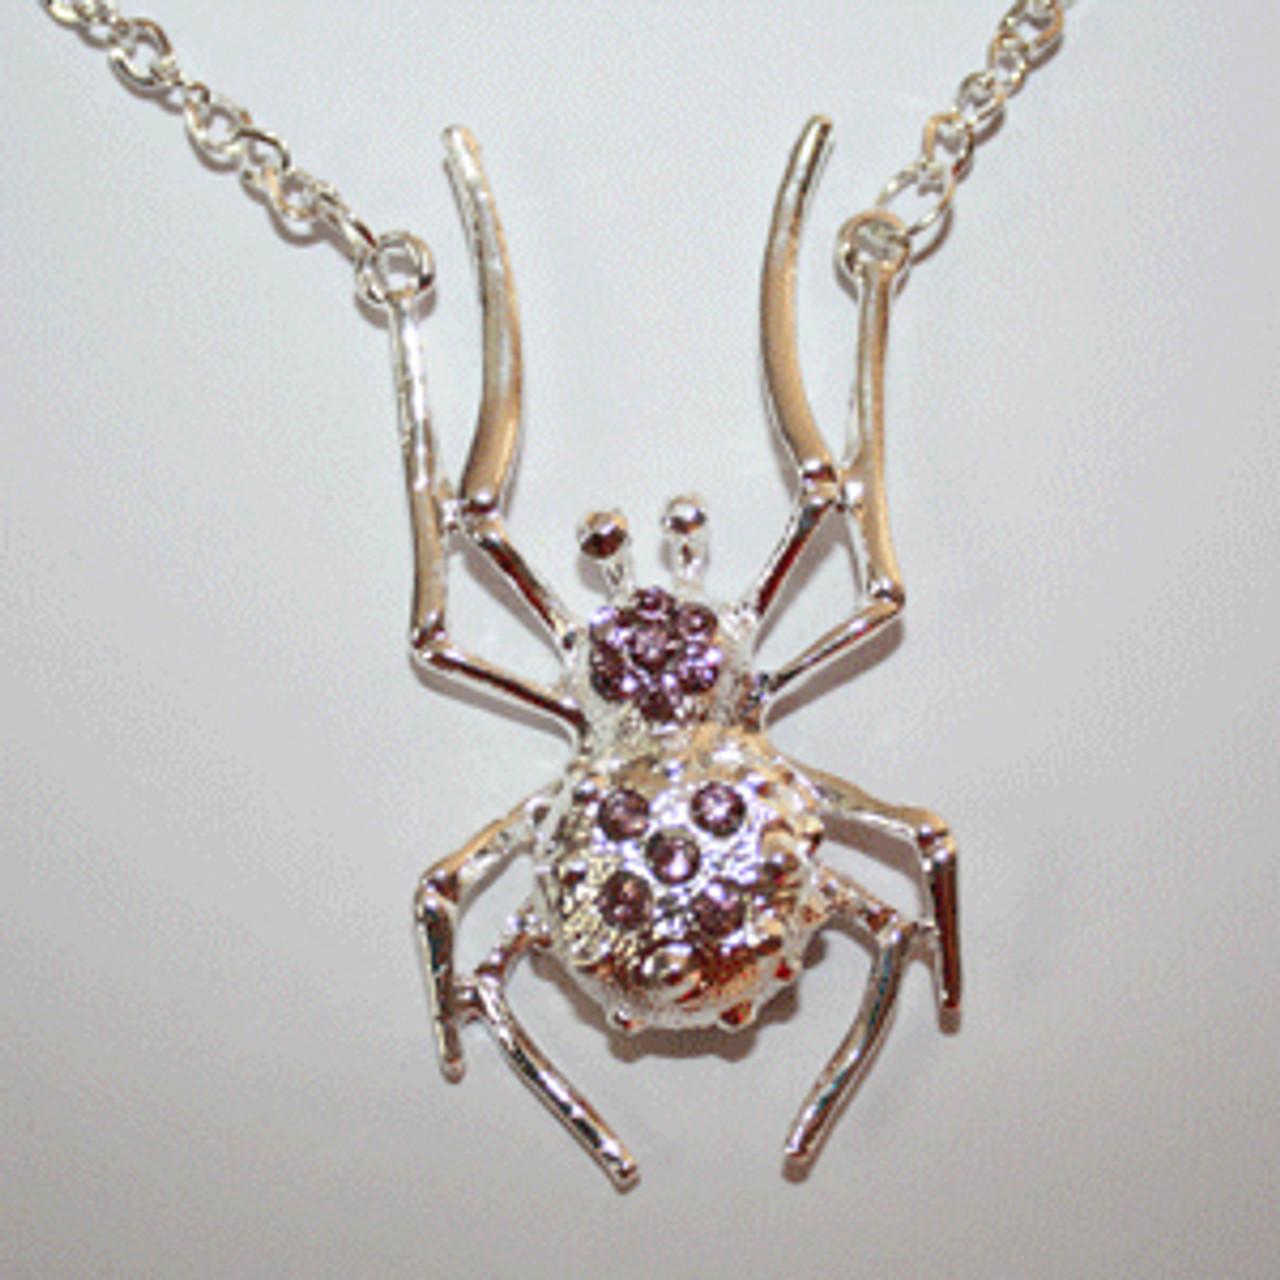 Spider necklace for dress up